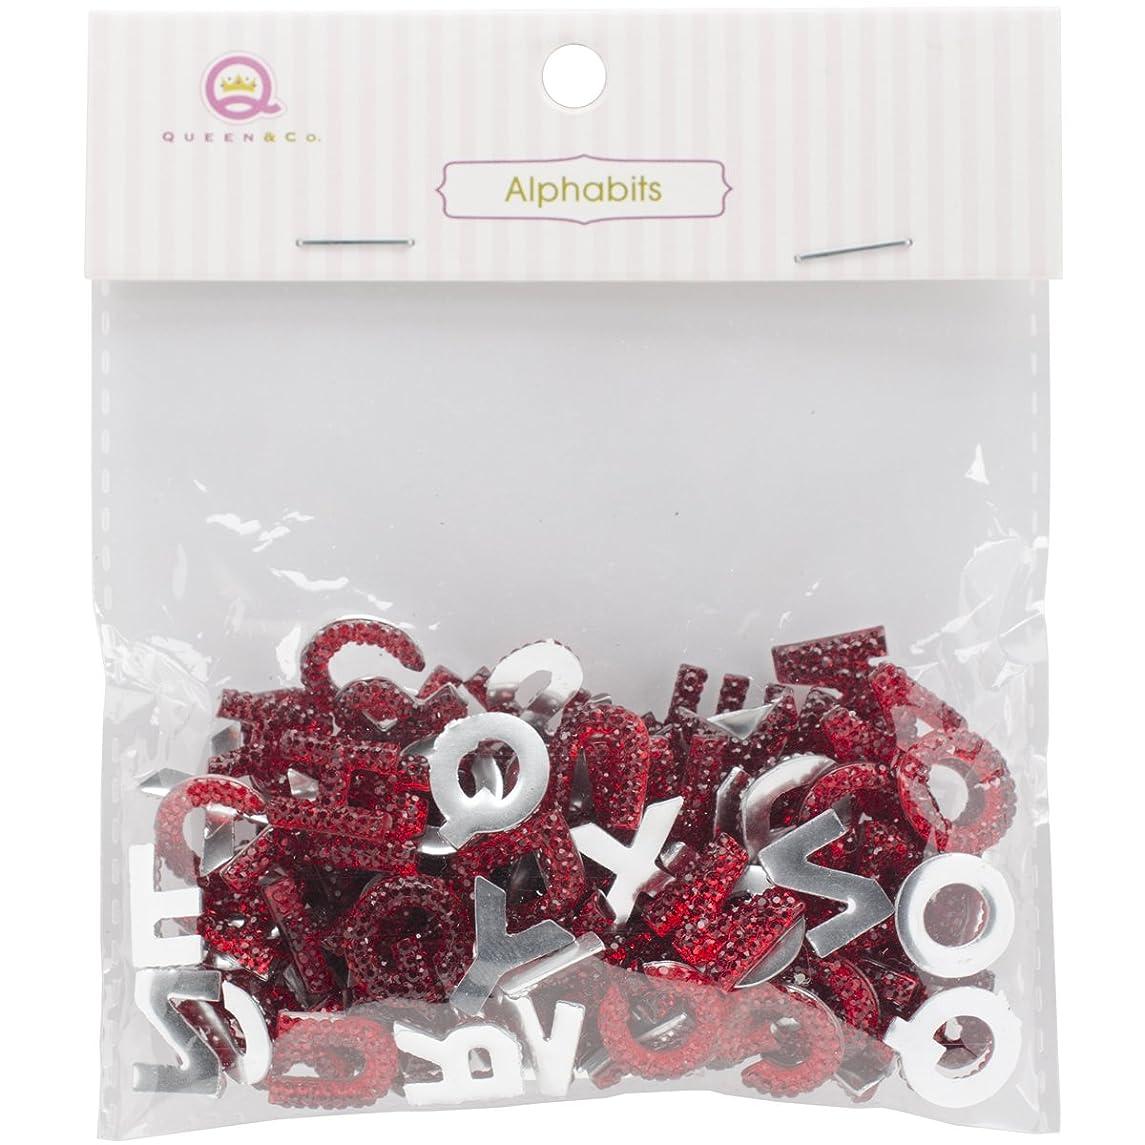 Queen & Co Alphabits Glitter Alphabet Colorful Accents, 0.5